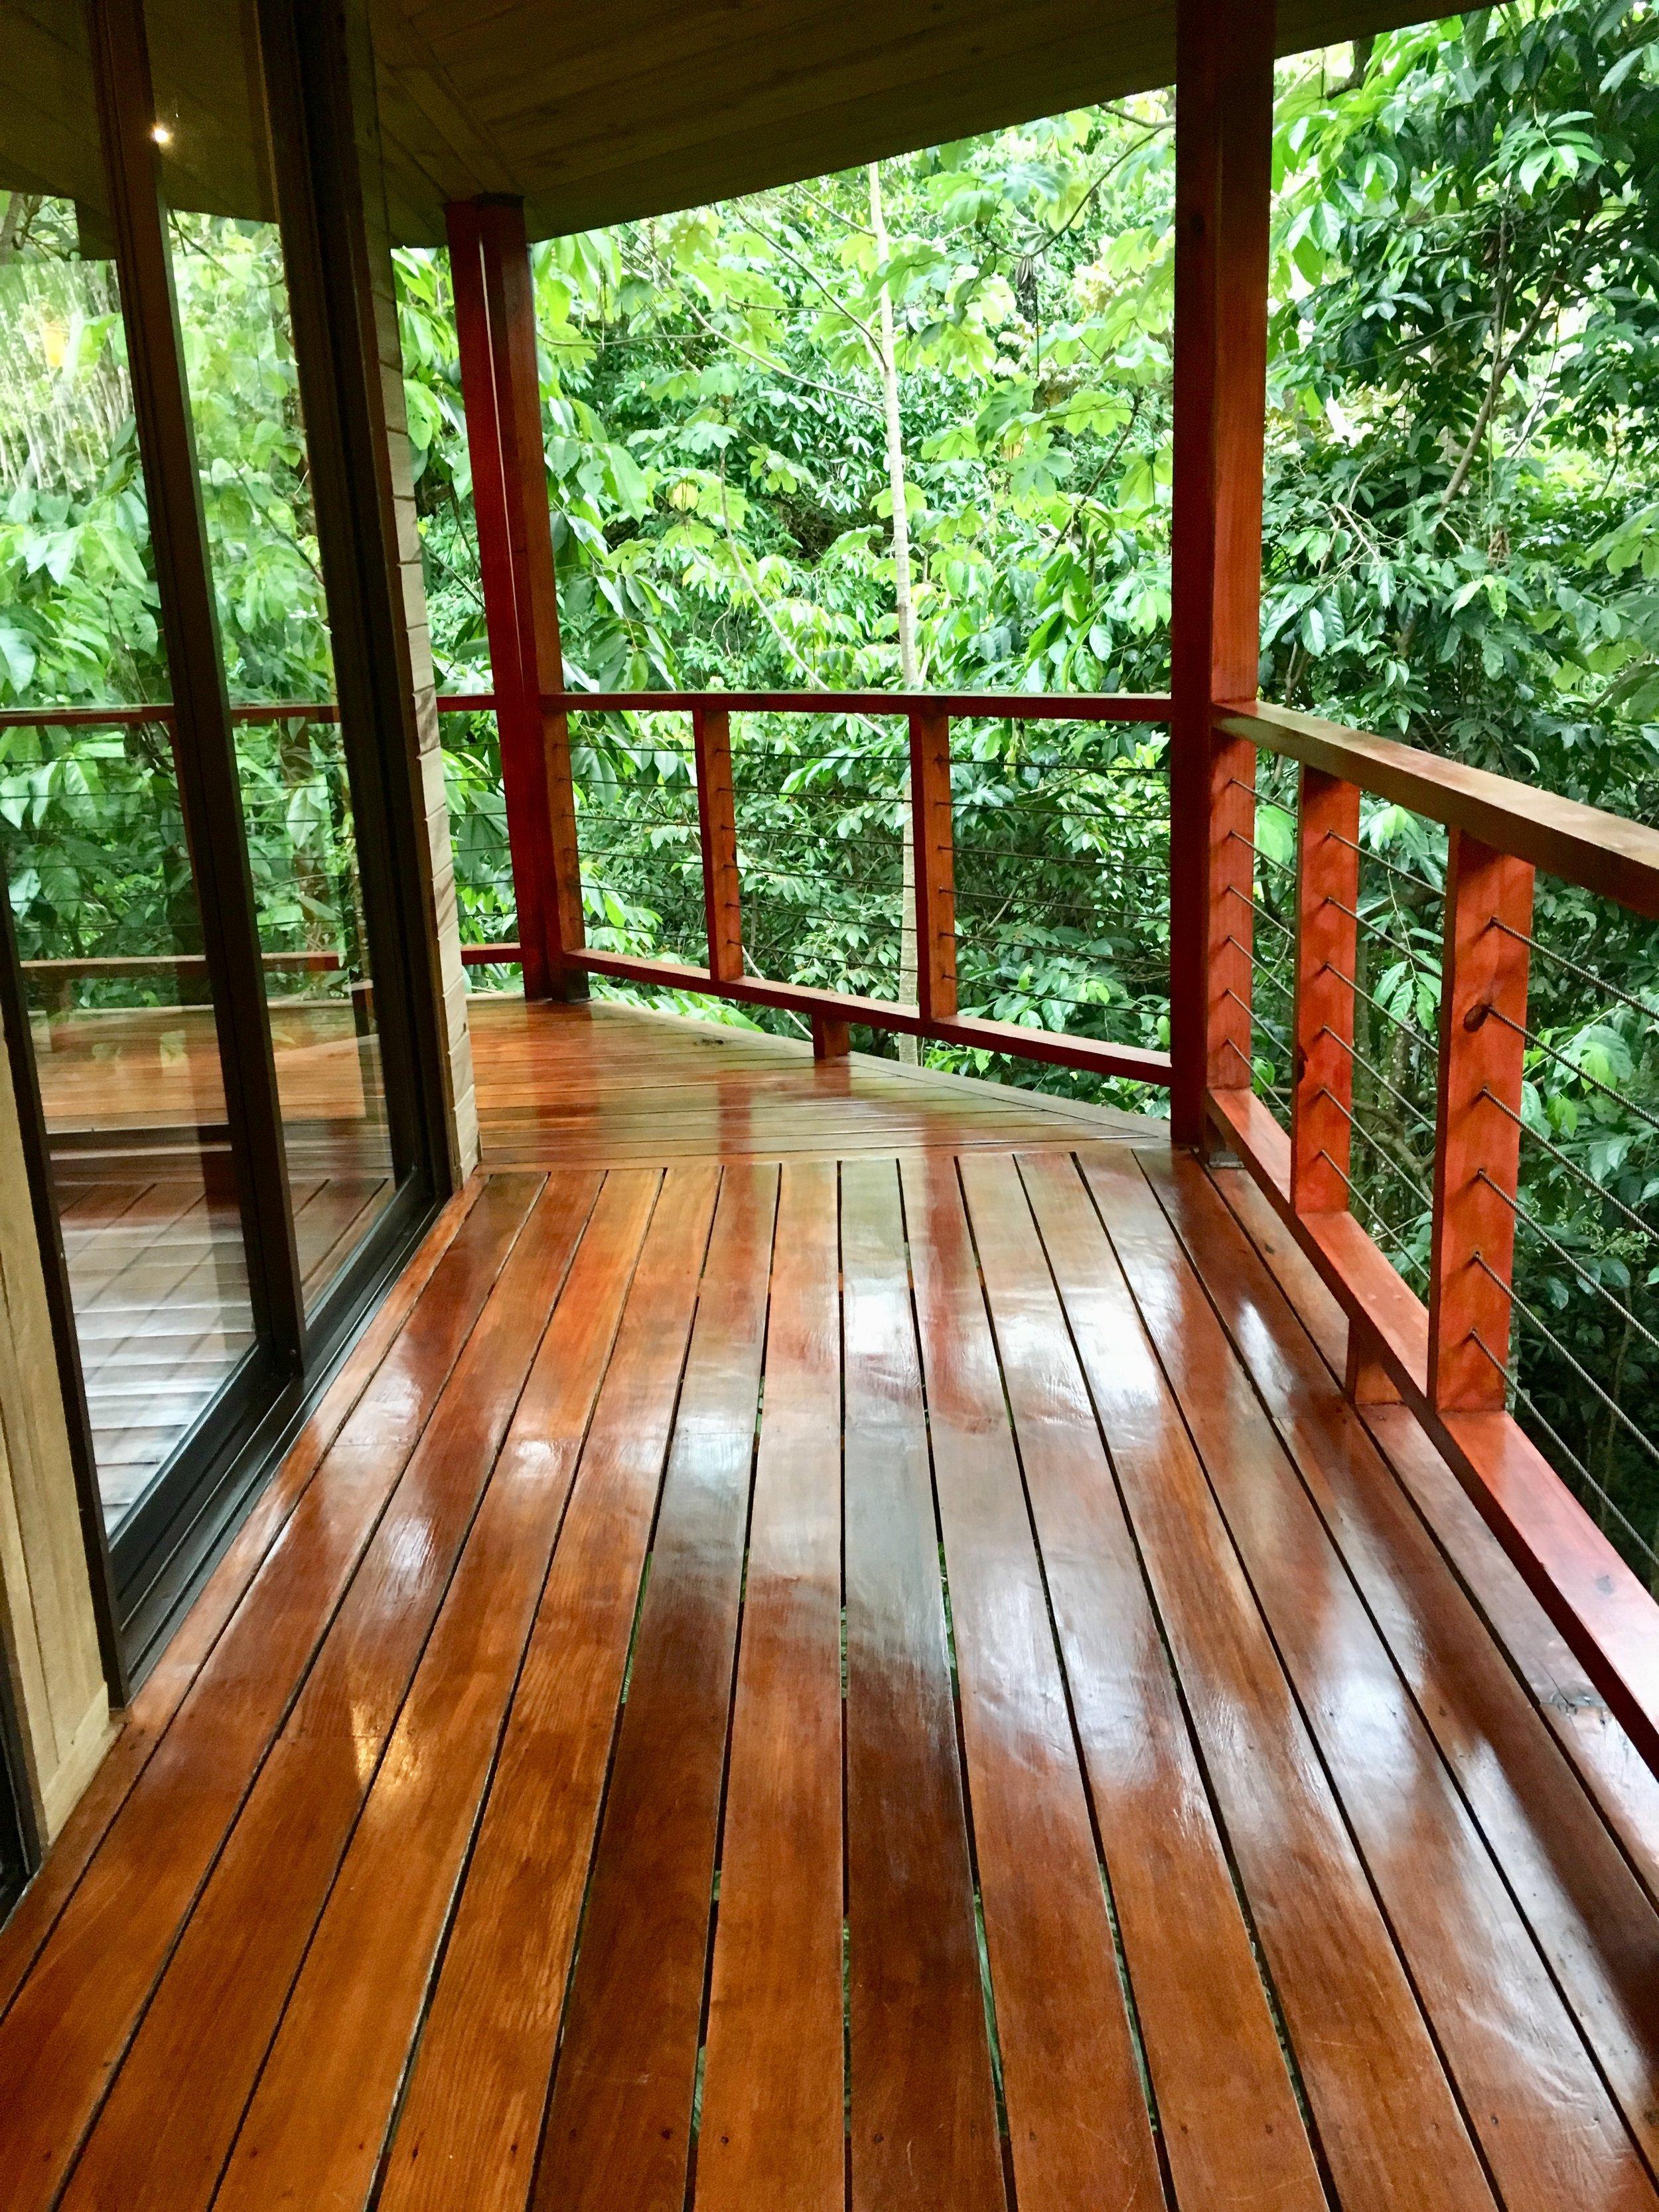 Upstairs deck overlooking jungle